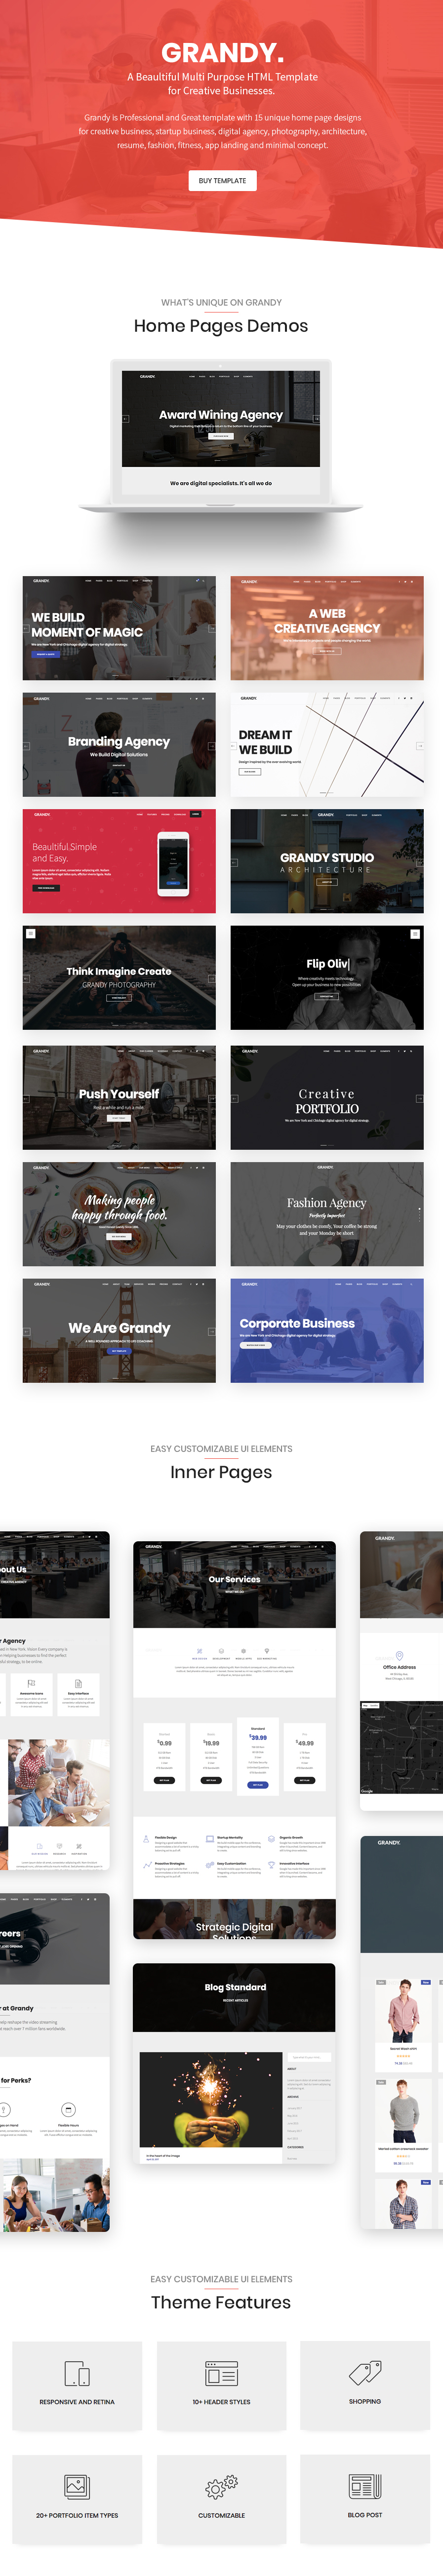 Grandy - Creative Multi Purpose Big HTML5 Template - 1